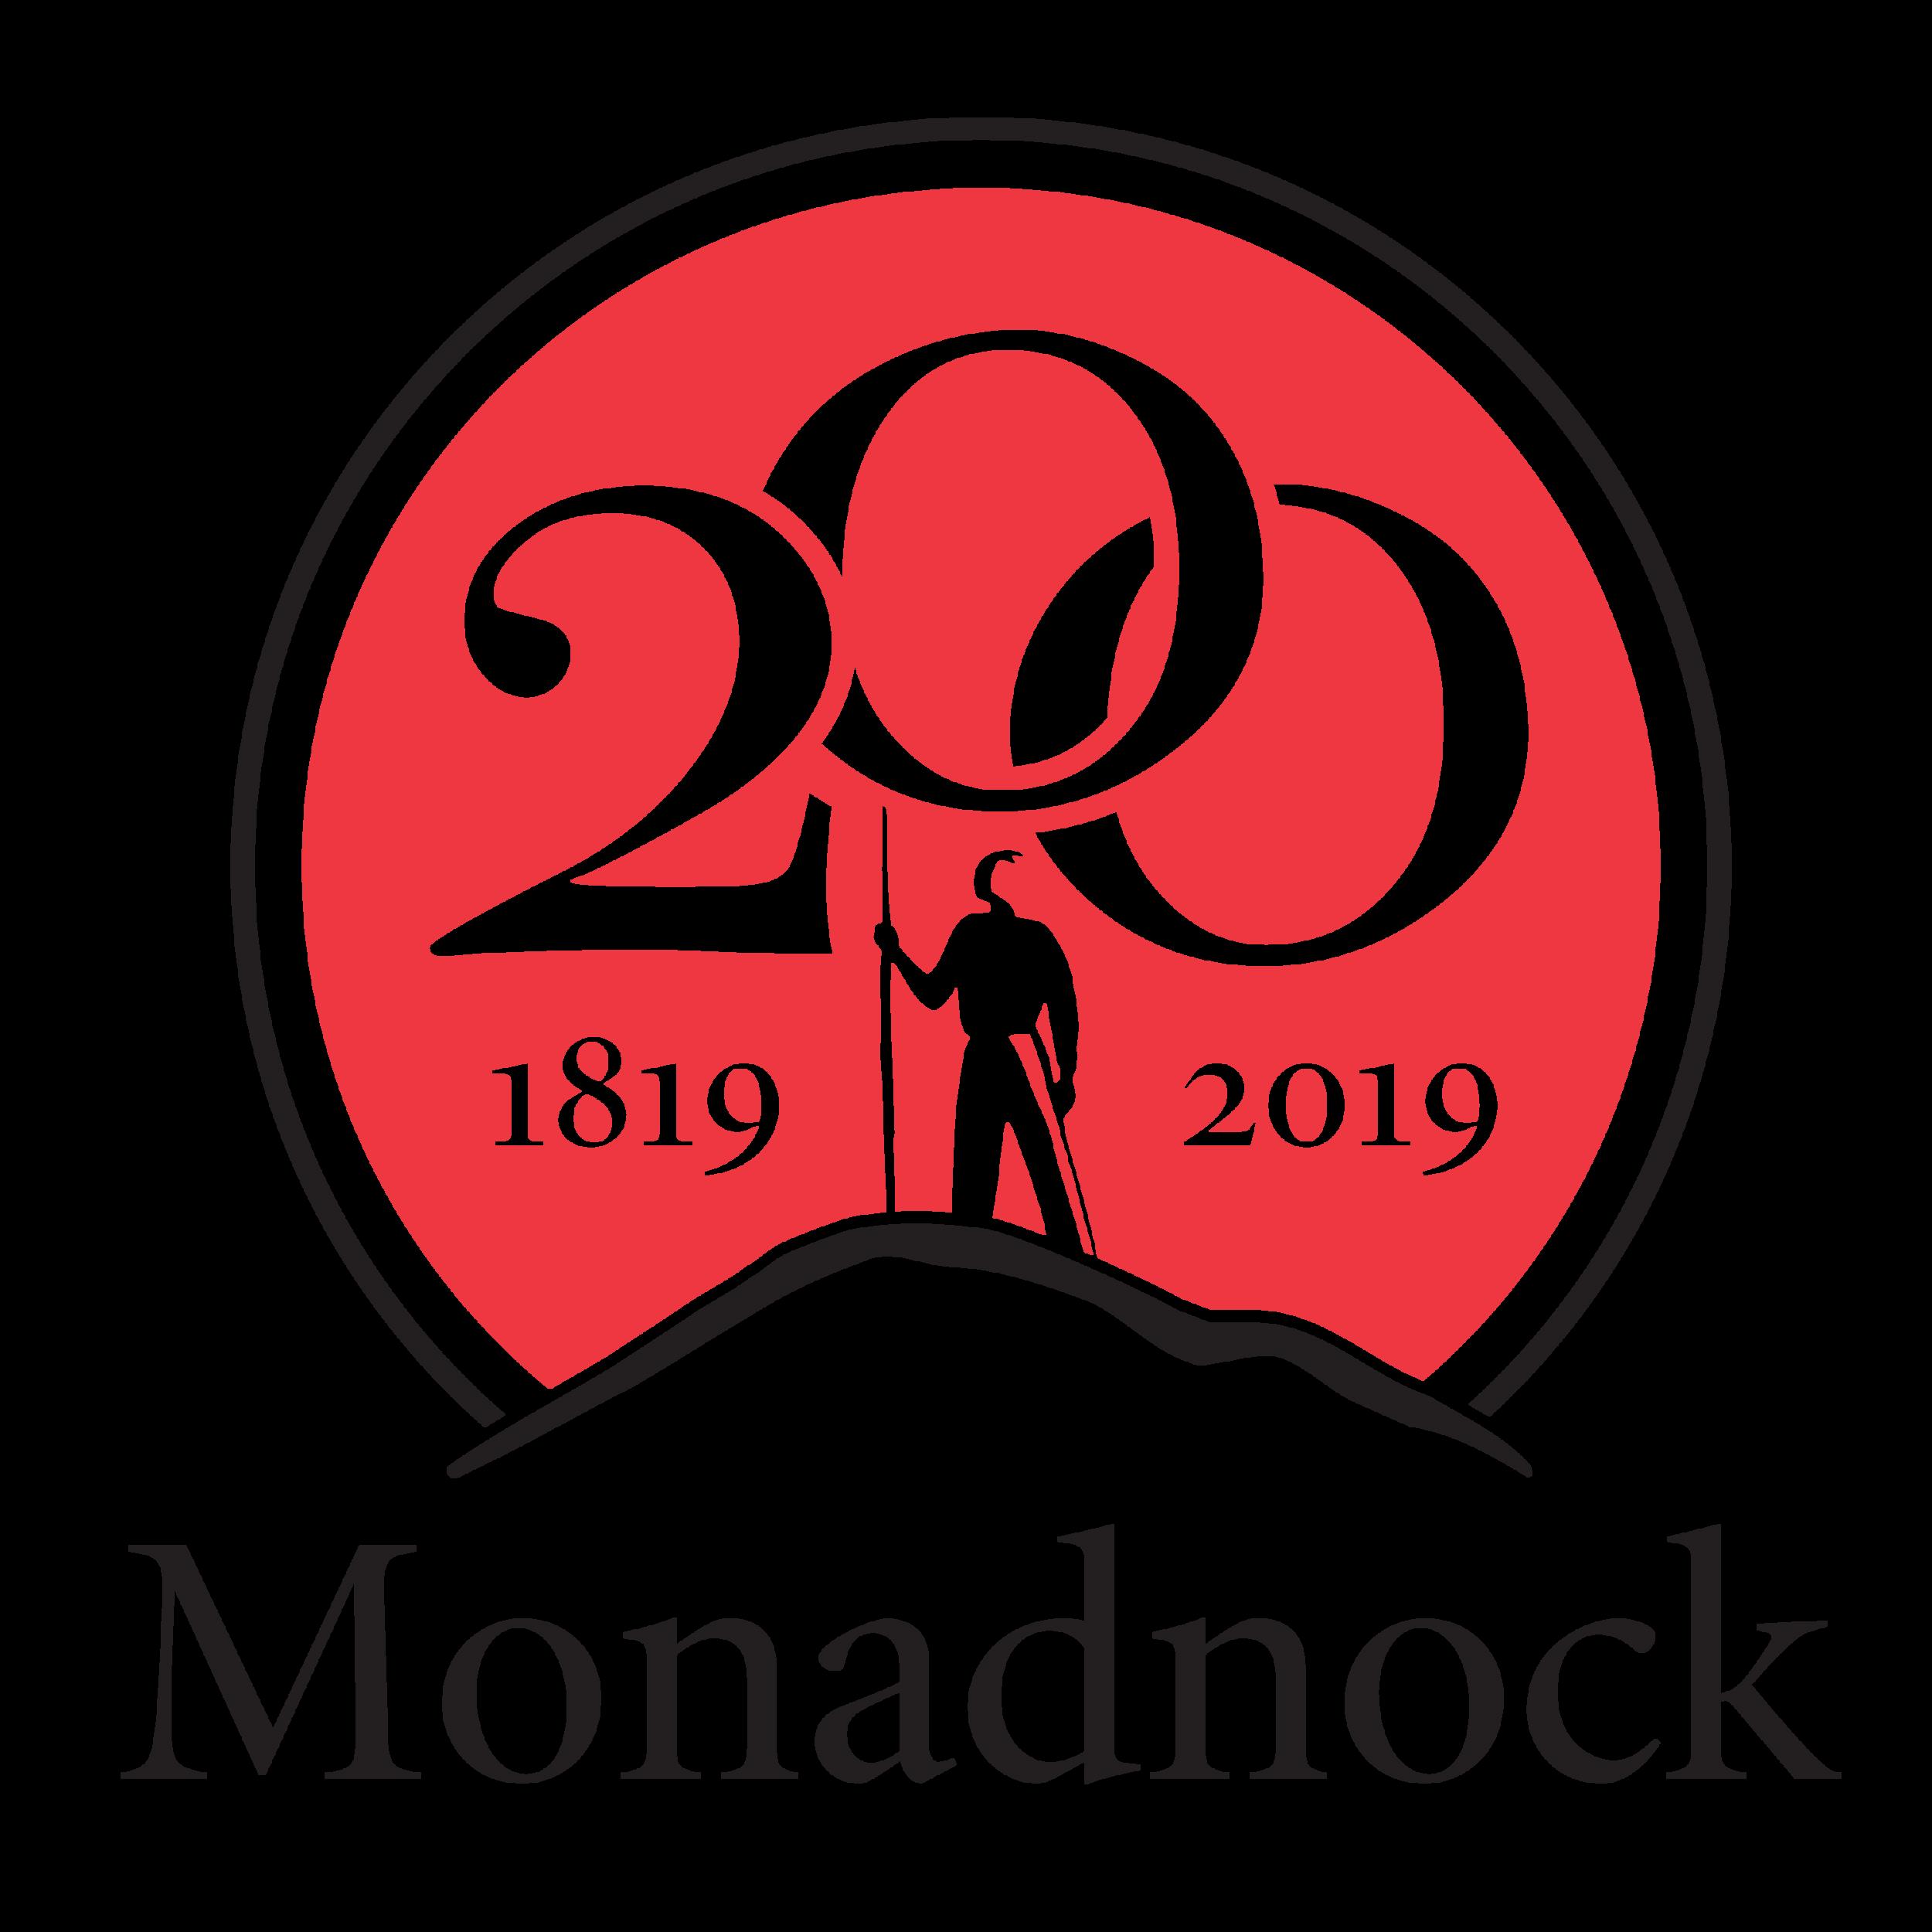 200thLogo_Monadnock_BlackRed.png